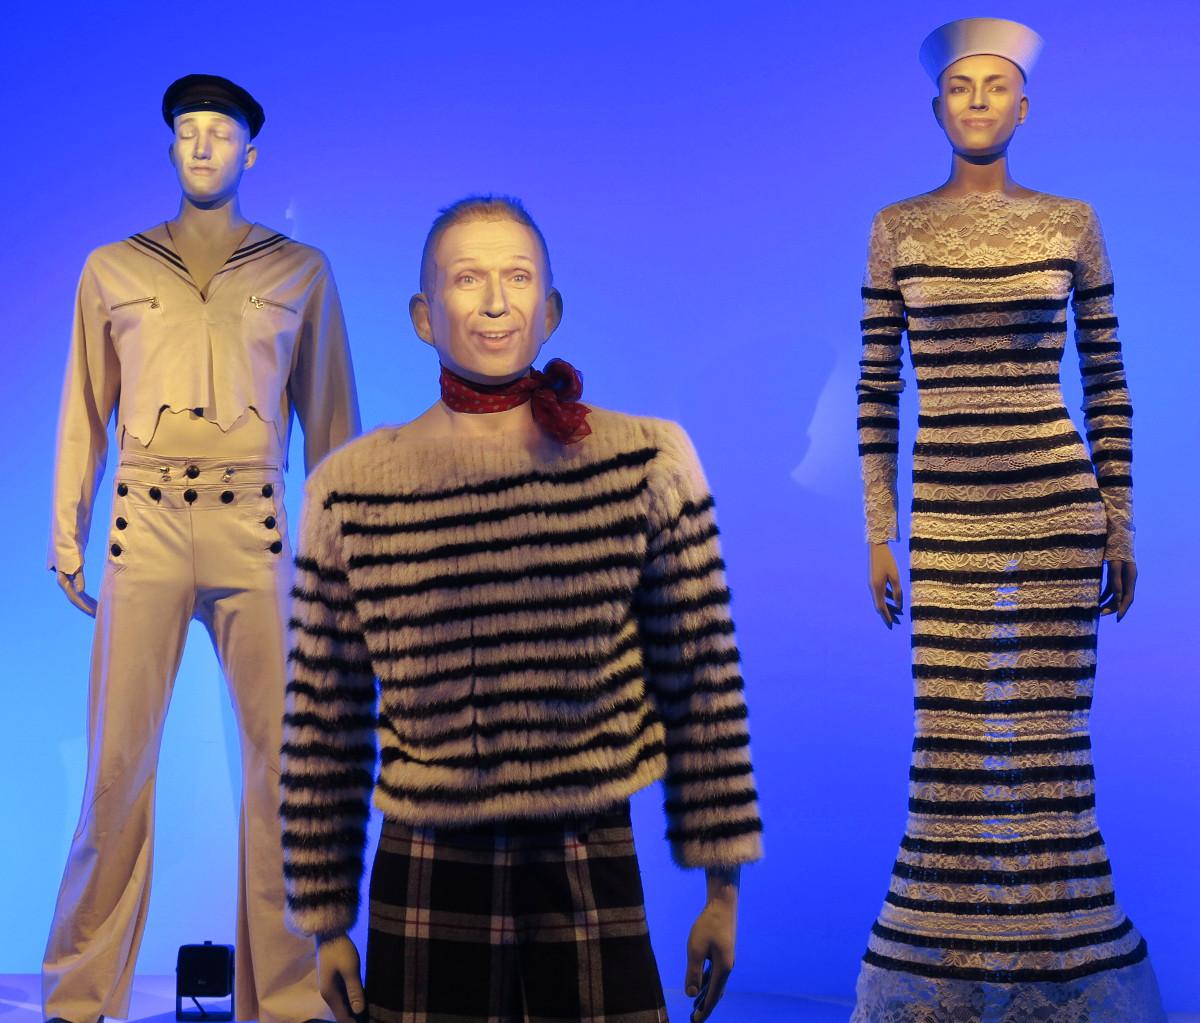 Interactive Jean Paul Gaultier National Gallery of Victoria